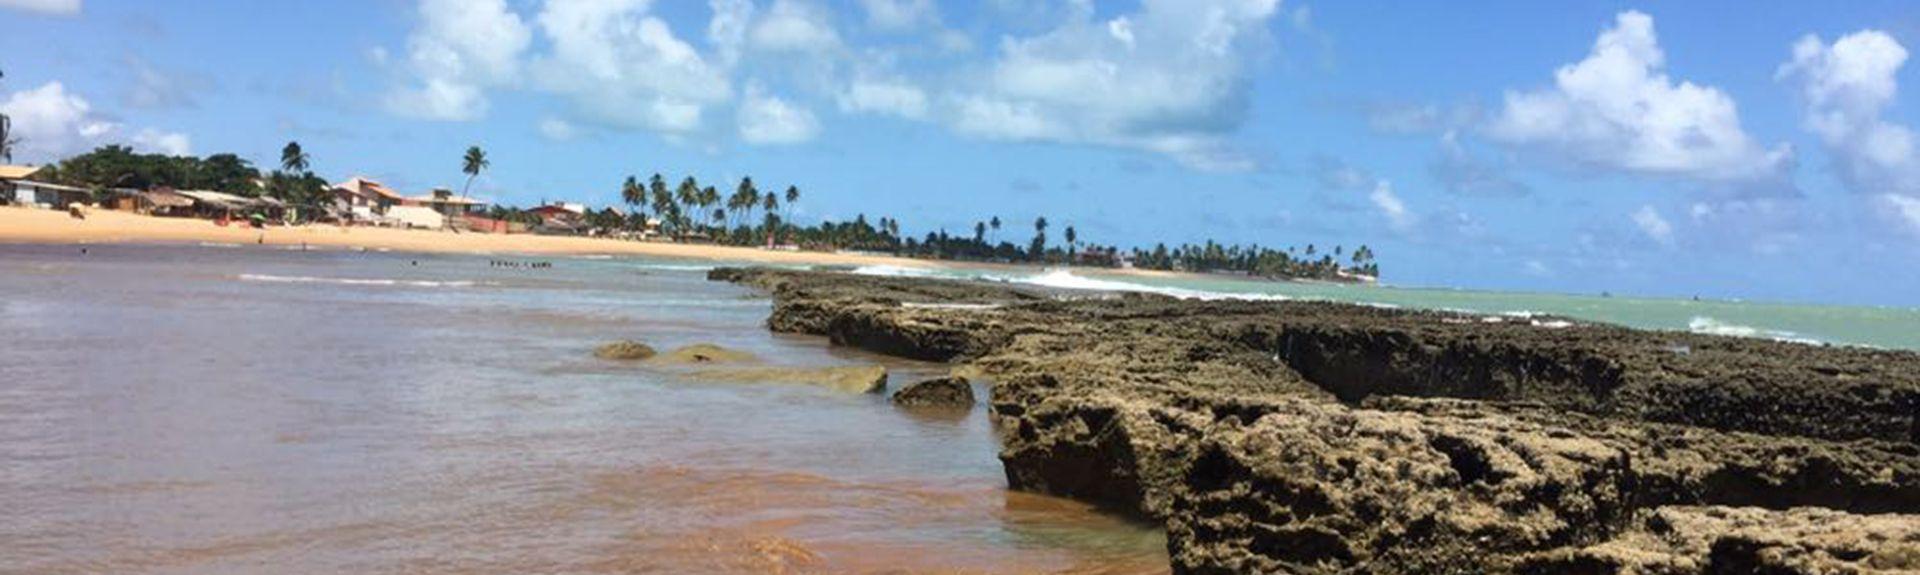 Passo de Camaragibe, Region Nordosten, Brasilien